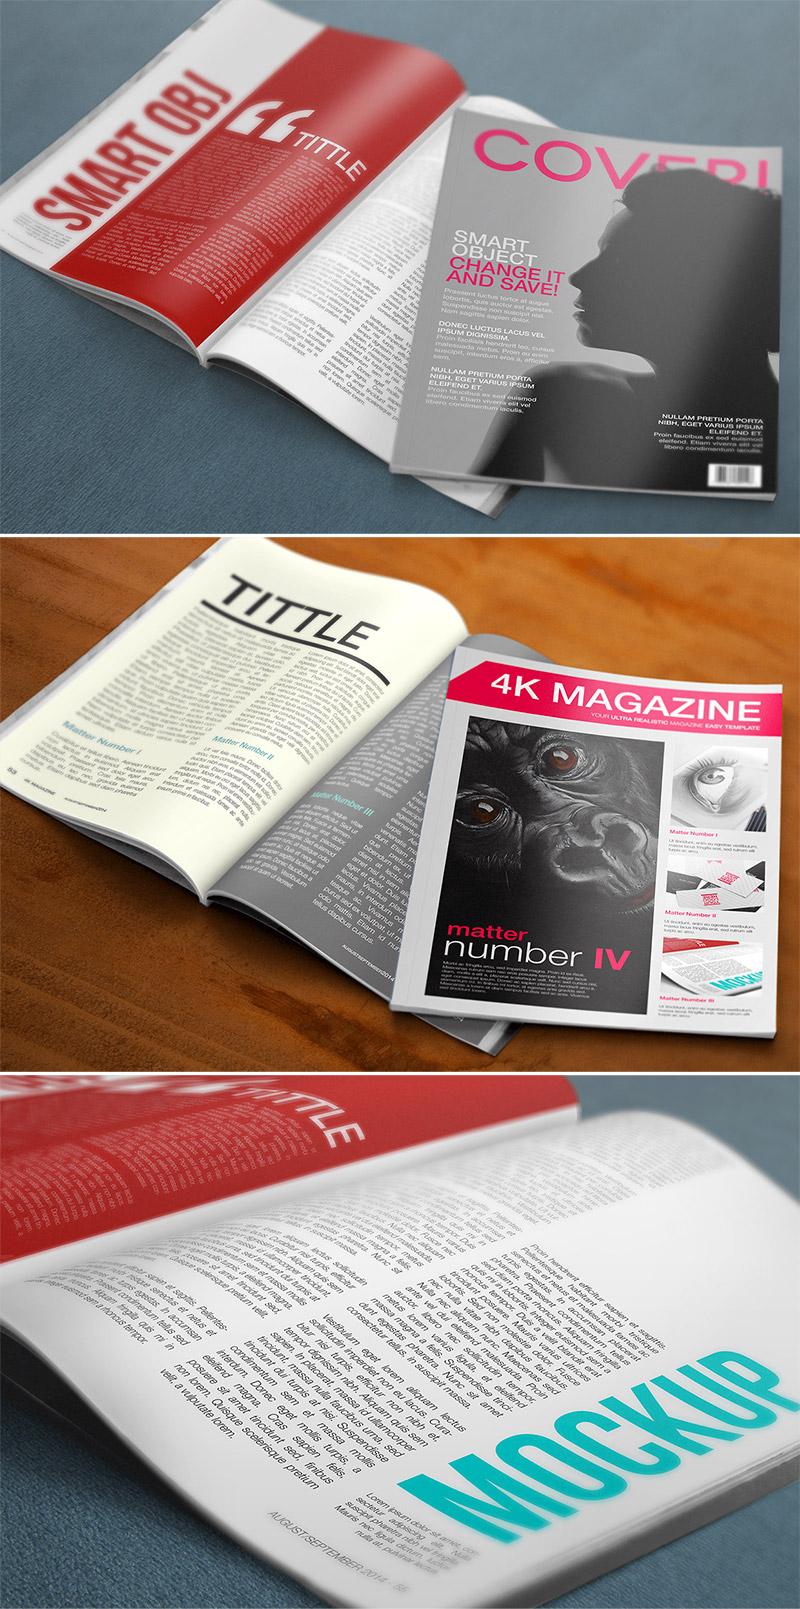 4k magazine mockup